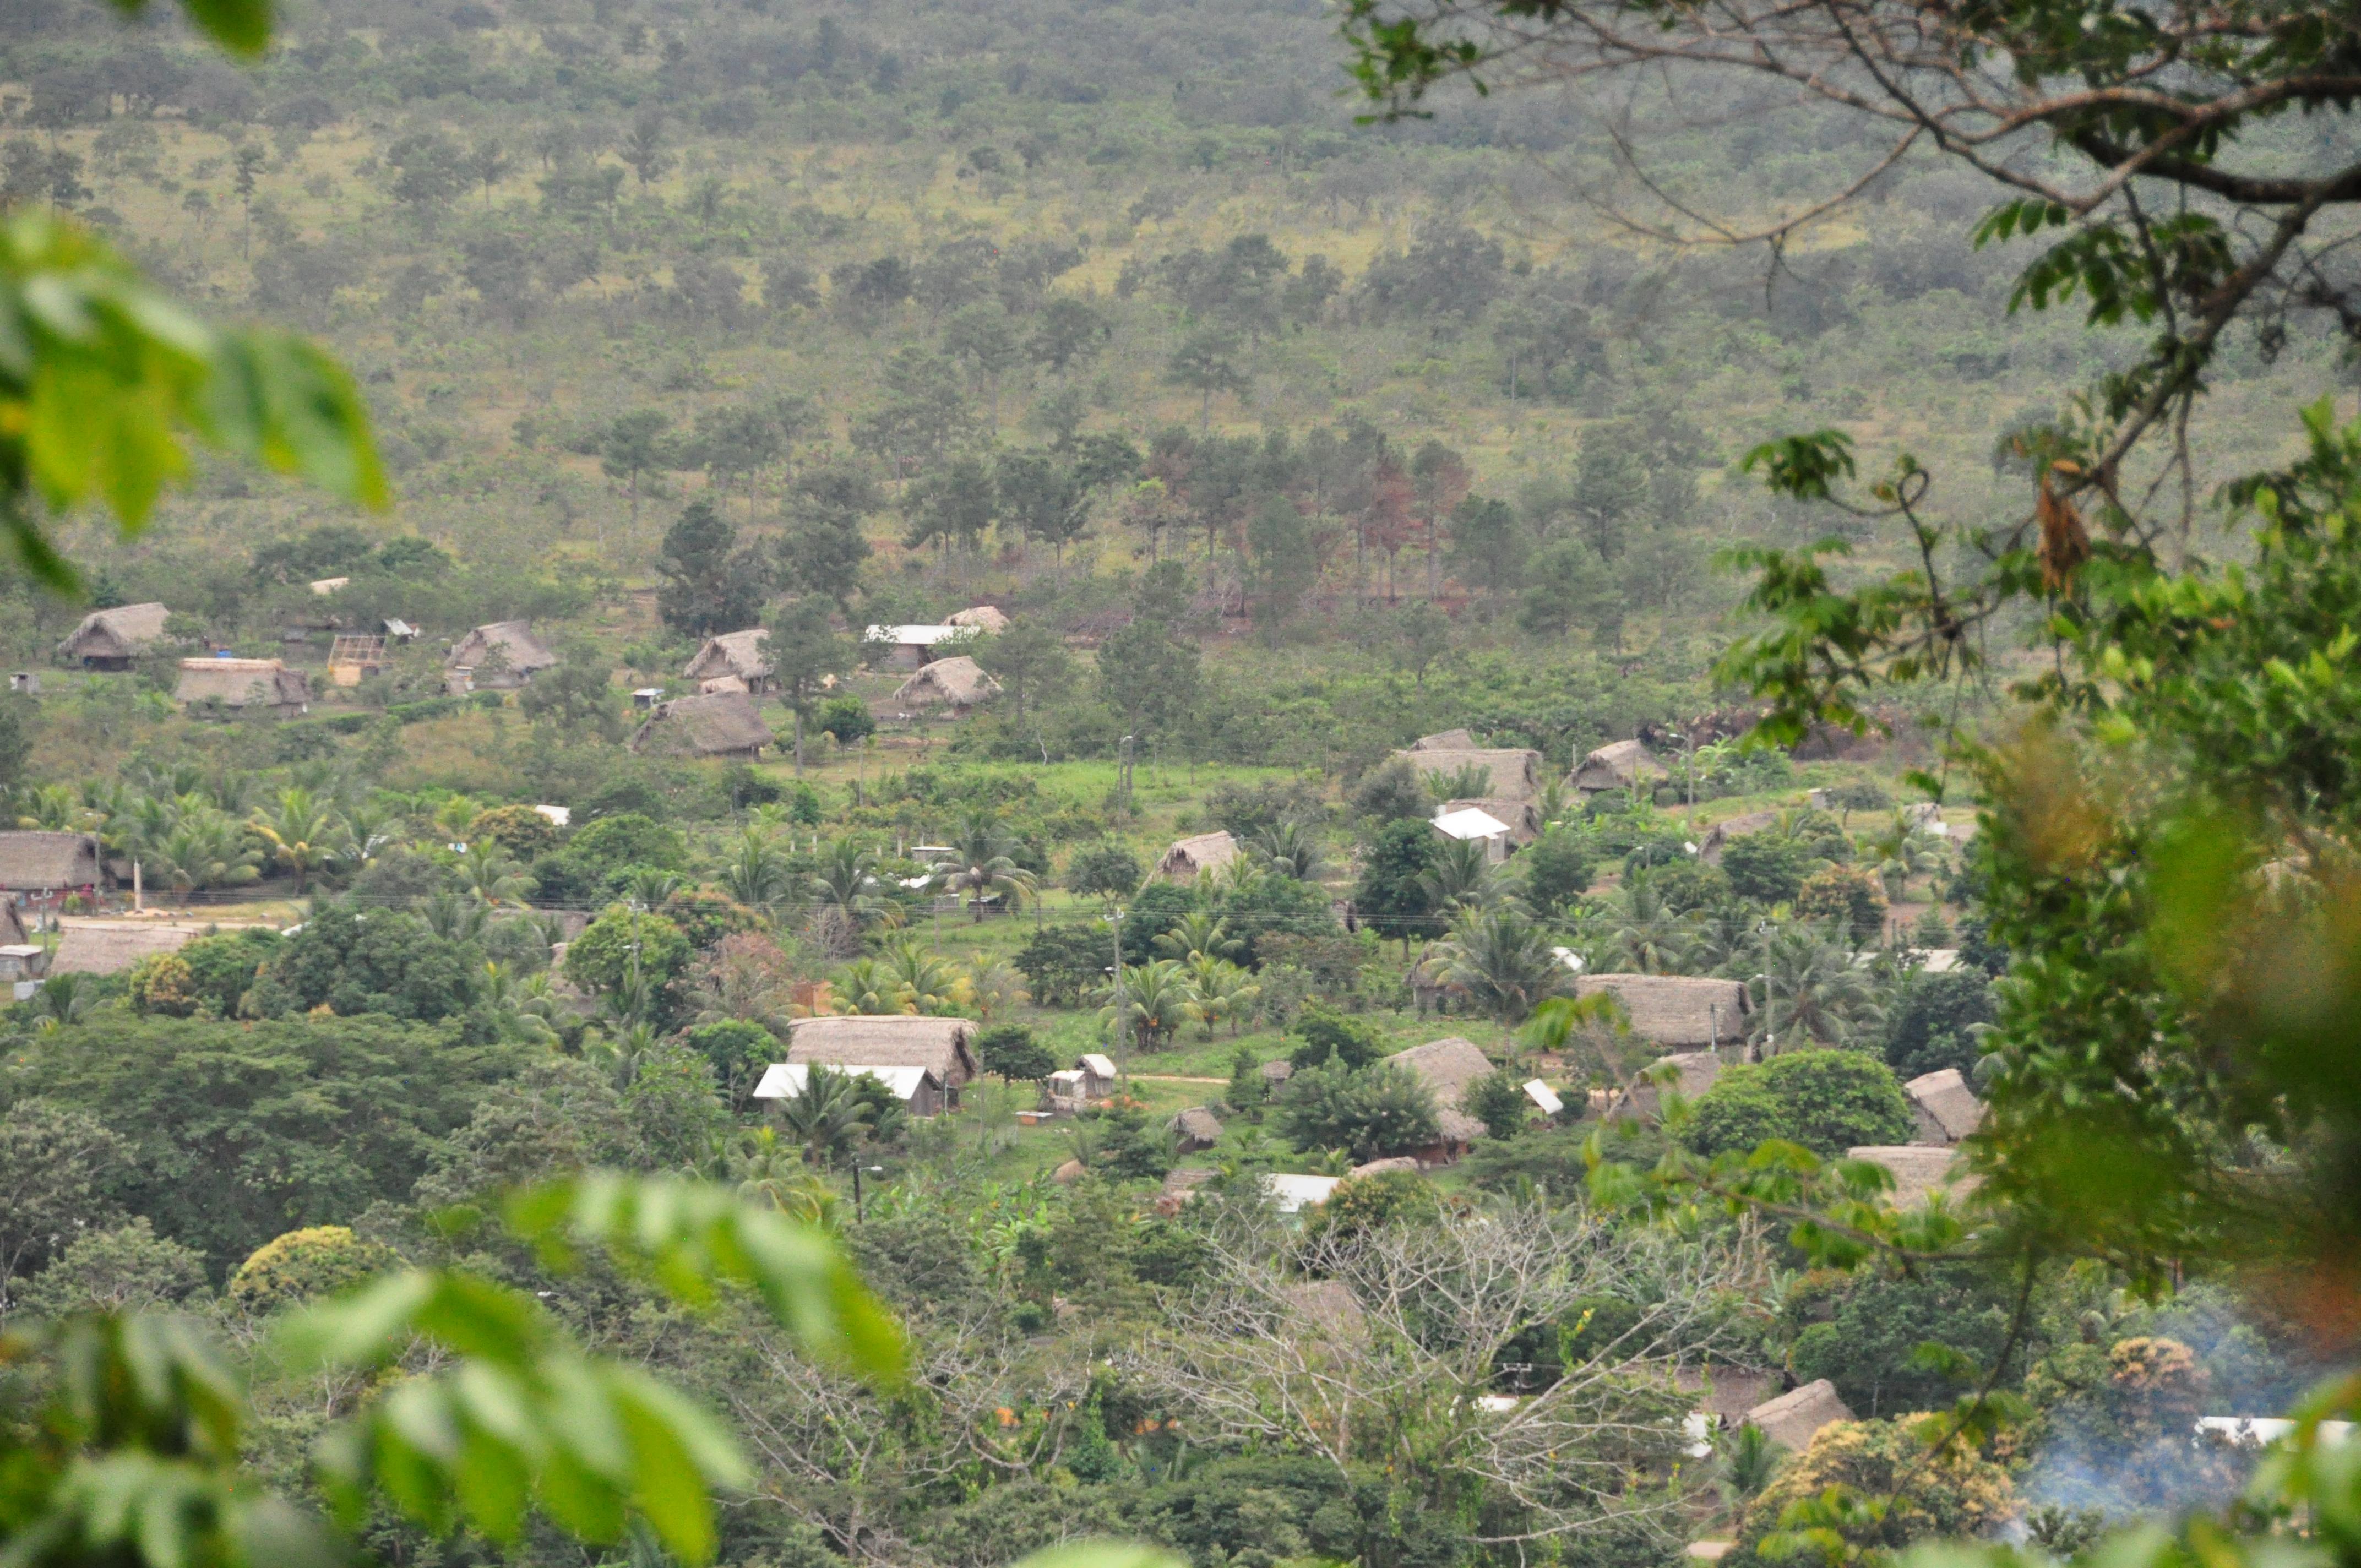 Mayan Village View